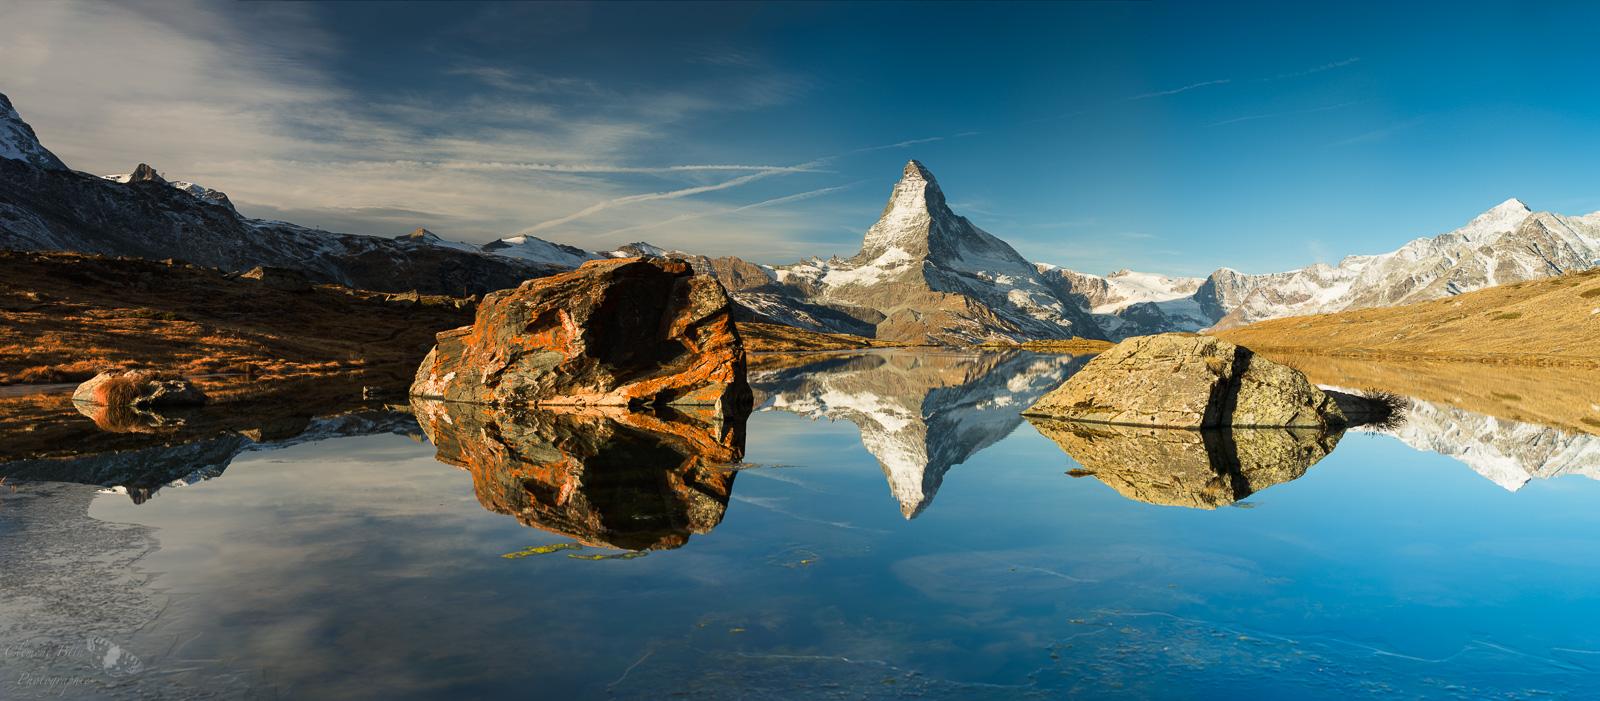 Mont-Cervin-reflet-stellisee.jpg